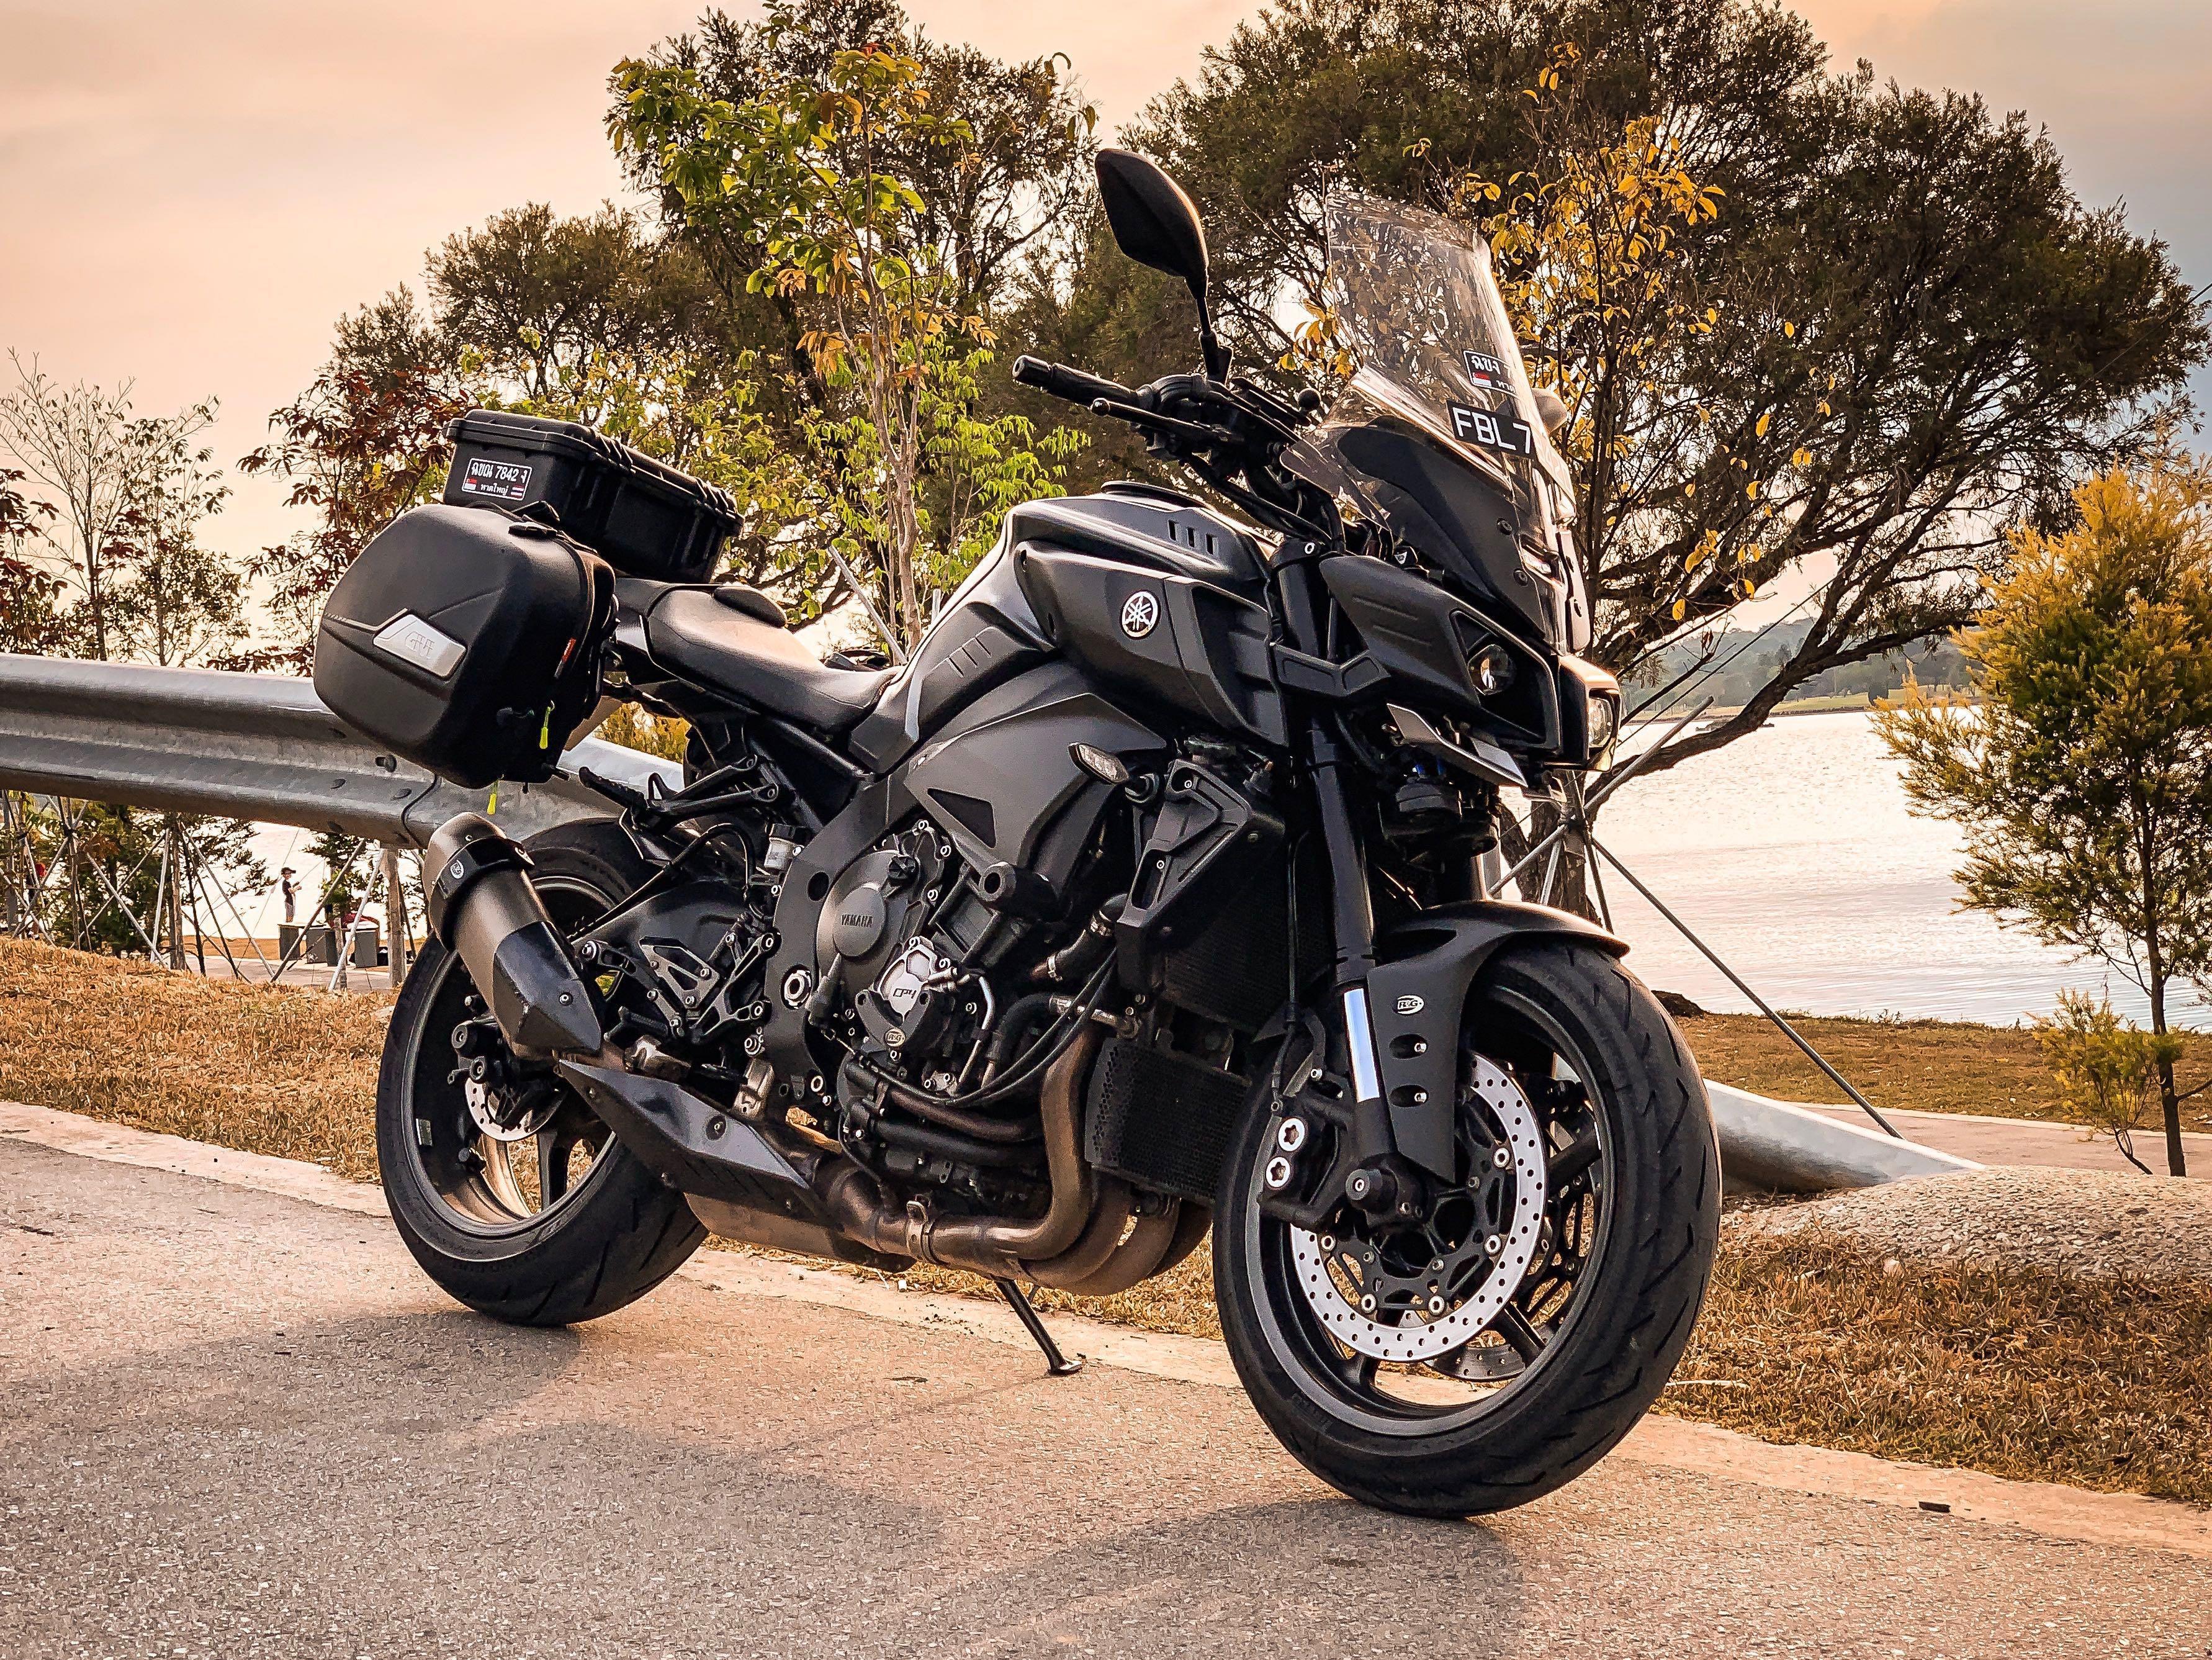 Yamaha MT-10 Touring (Aftermarket), Motorbikes, Motorbikes